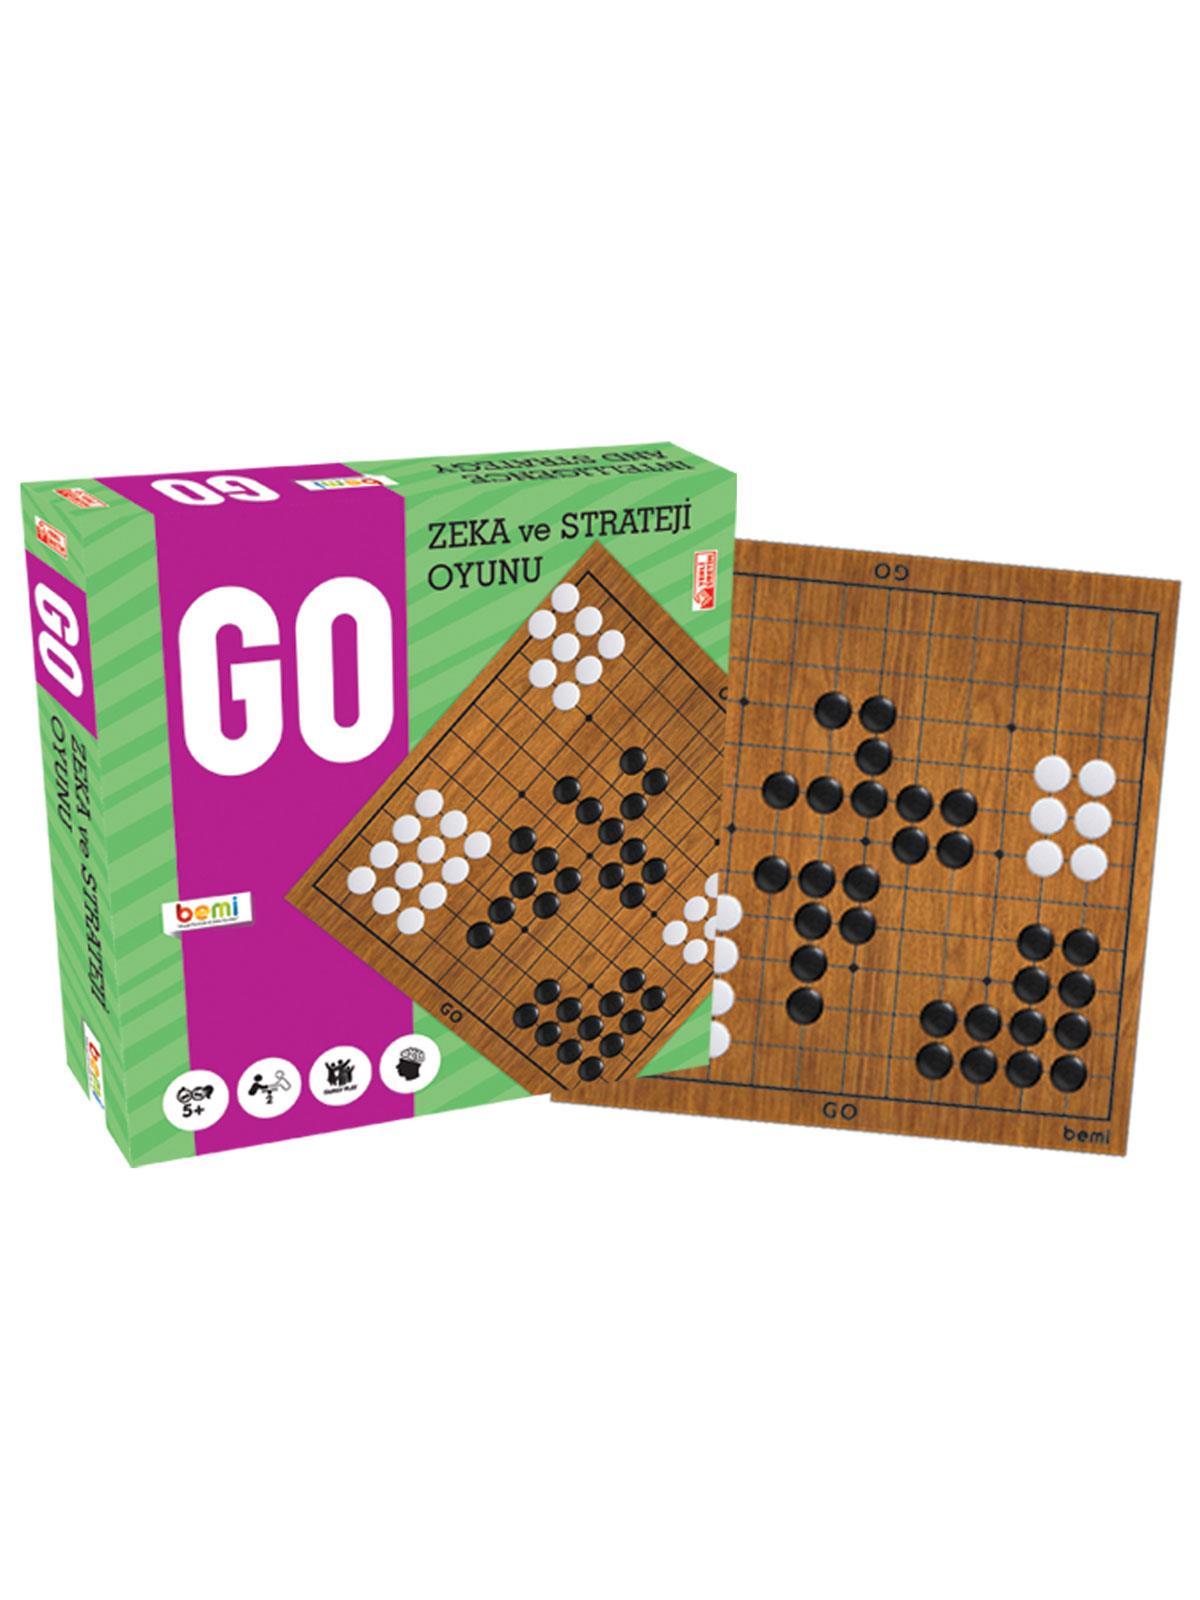 Bm0428 Bemi Toys Ahsap Go Oyunu 5 Yas